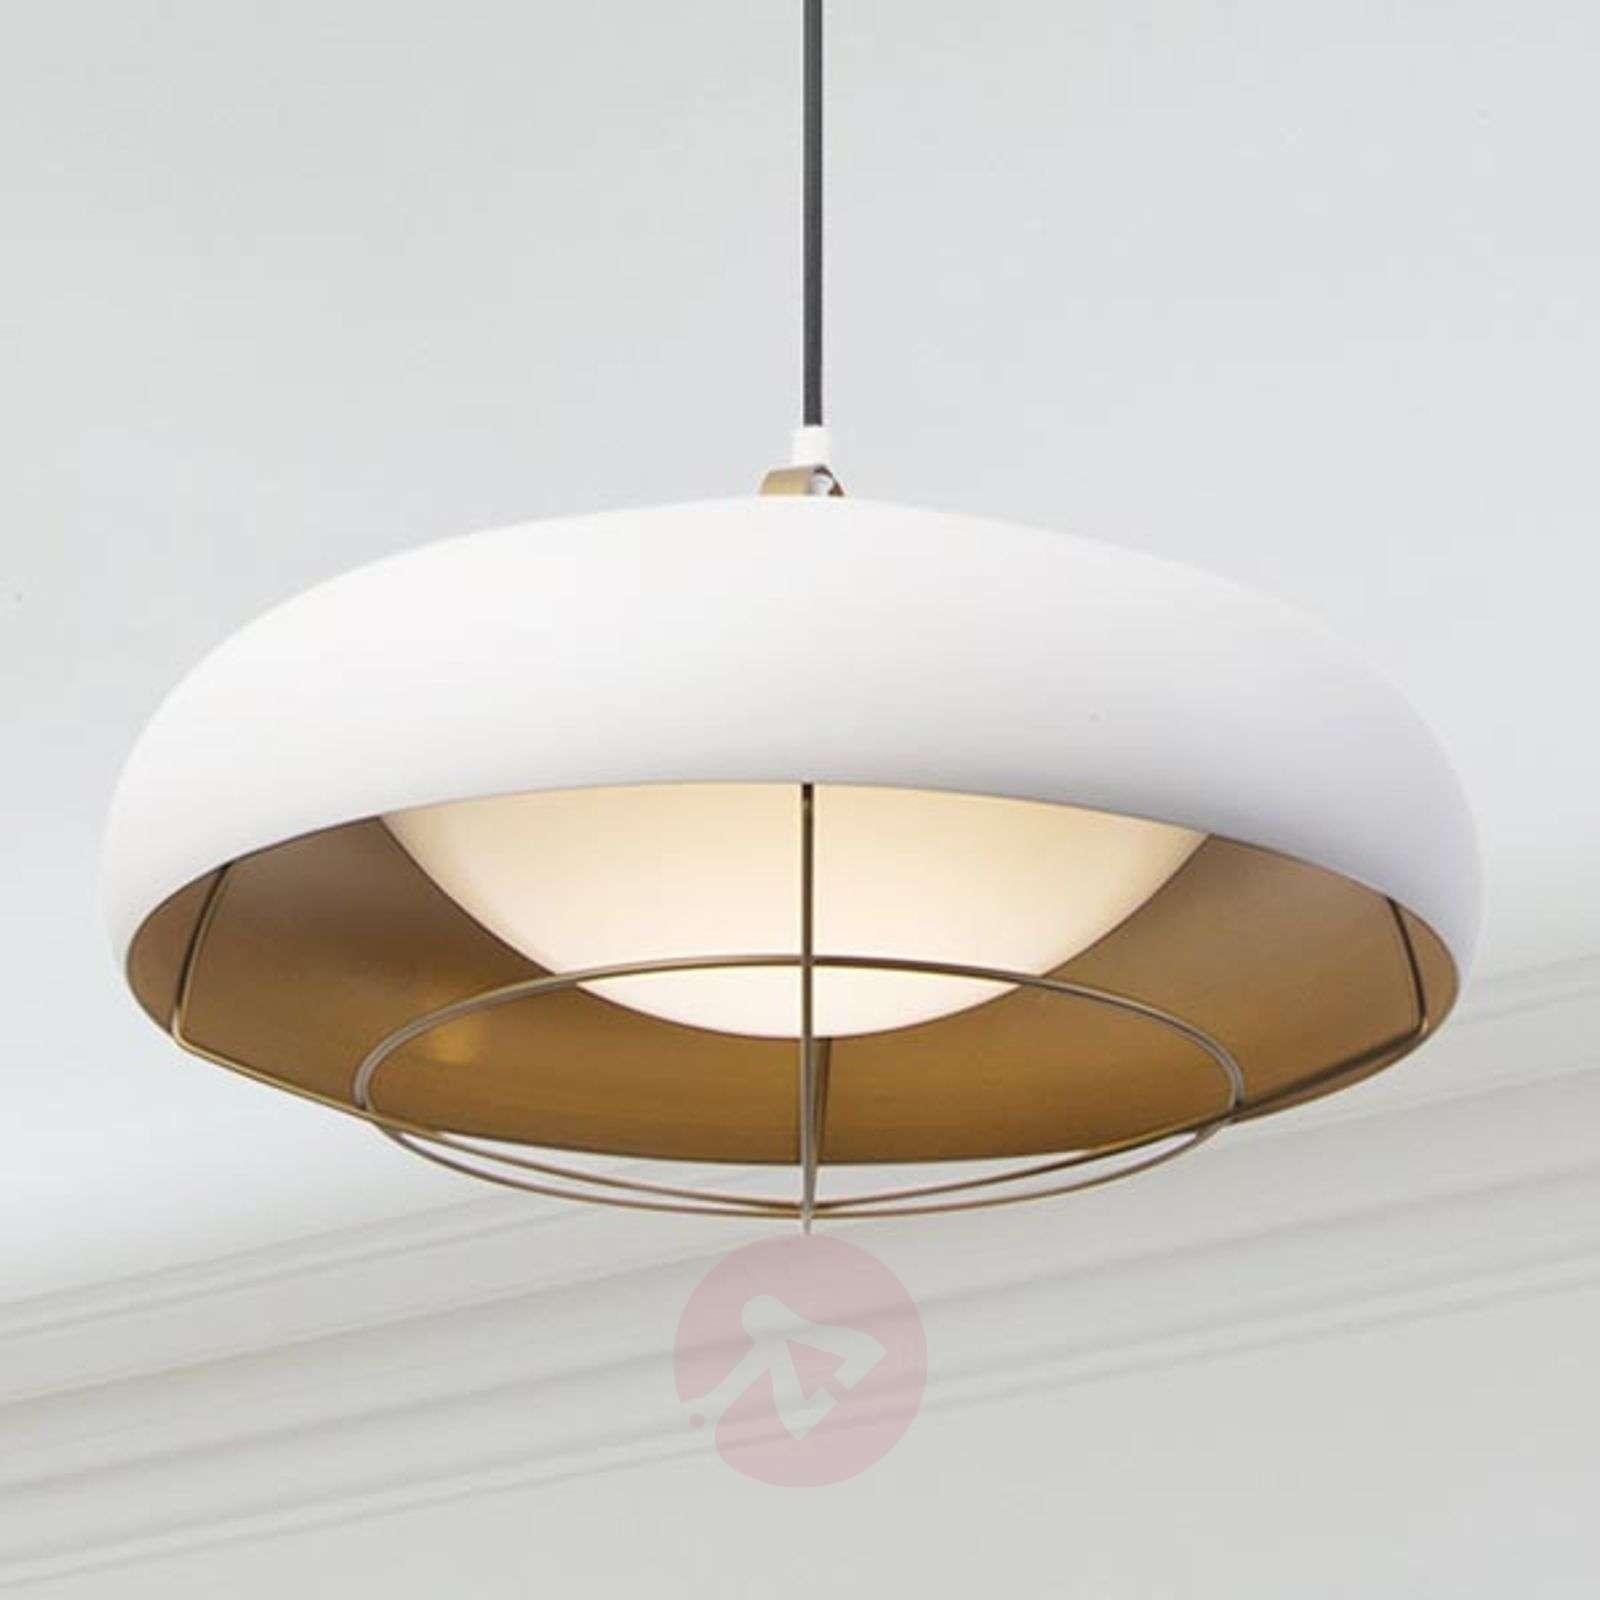 lighting industrial look. Sugar LED Pendant Light With An Industrial Look-6026589-01 Lighting Look O